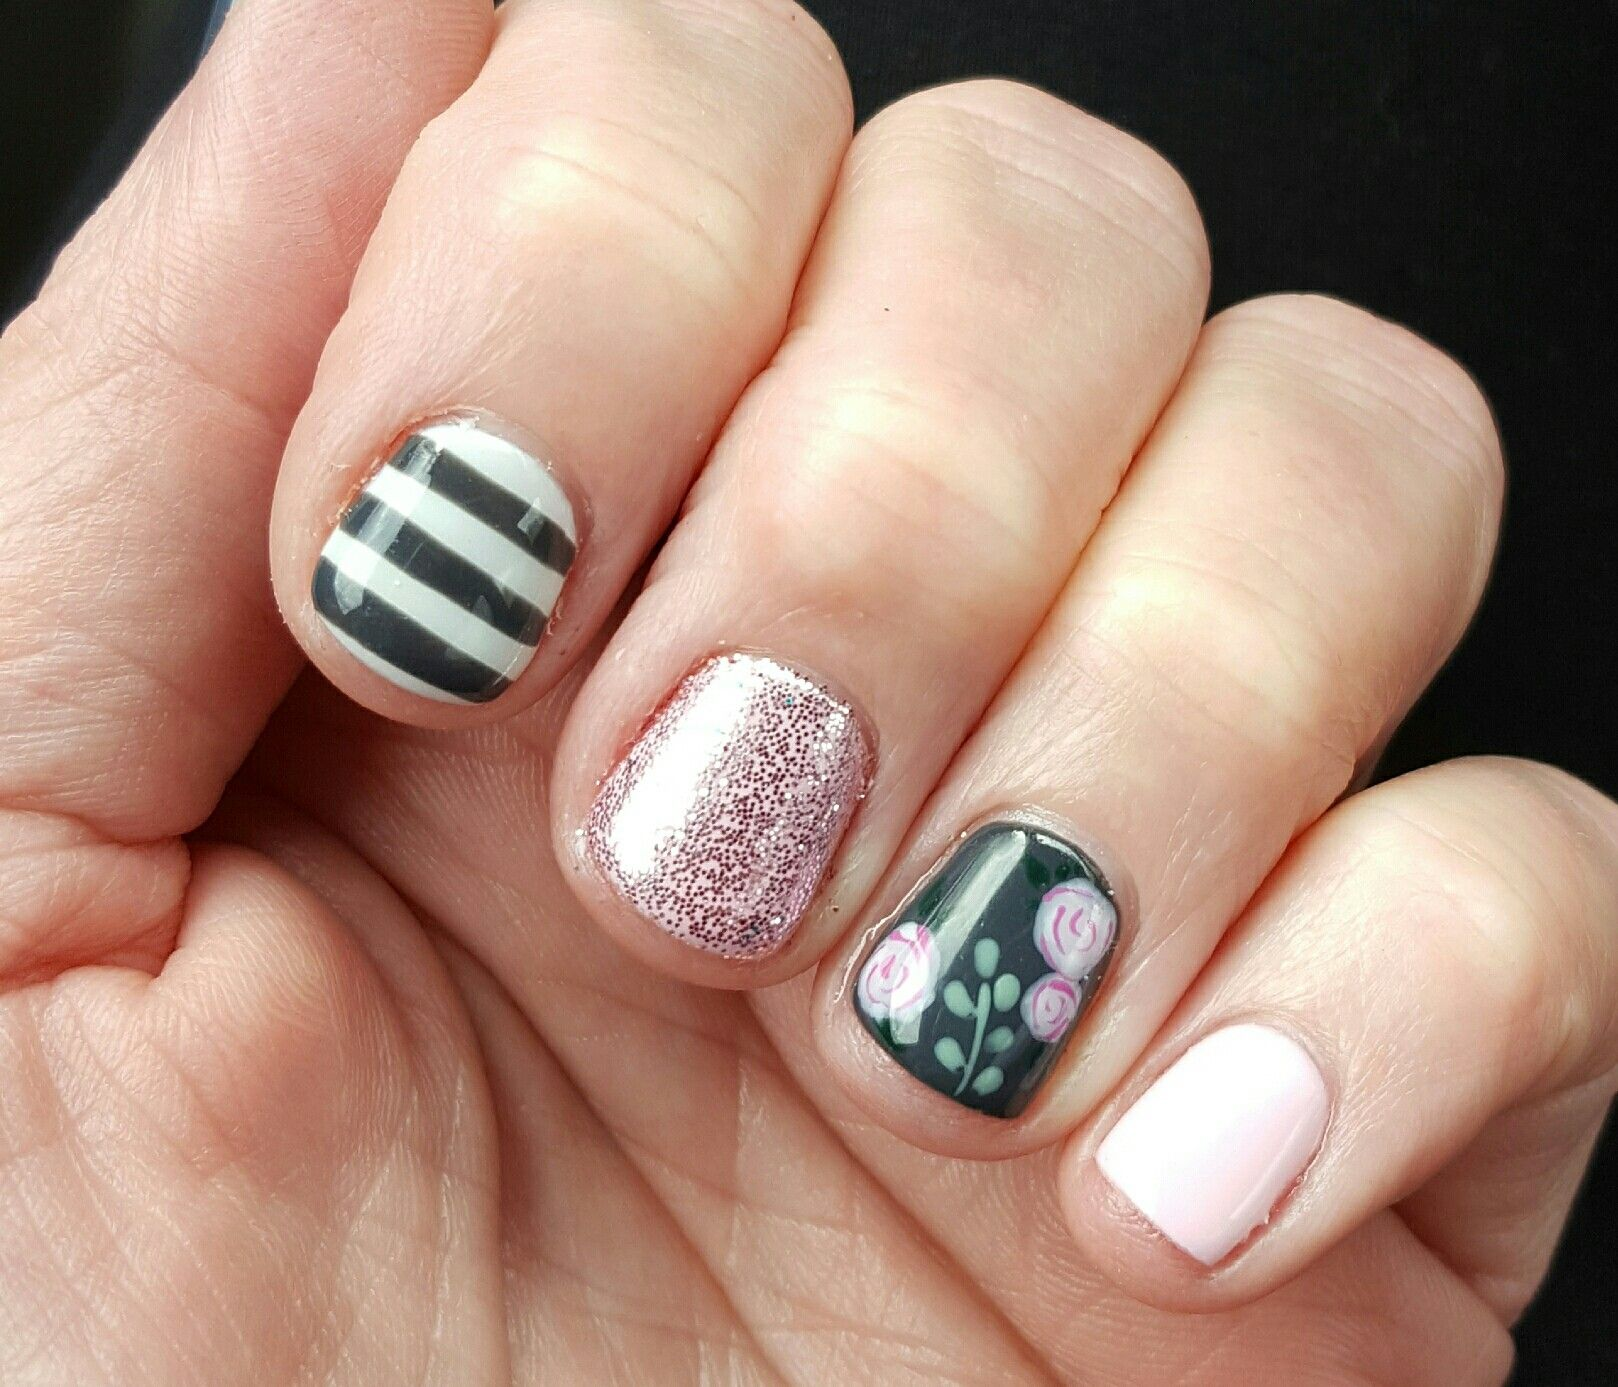 Dark striped floral nails. Pink and grey nails   nails   Pinterest ...